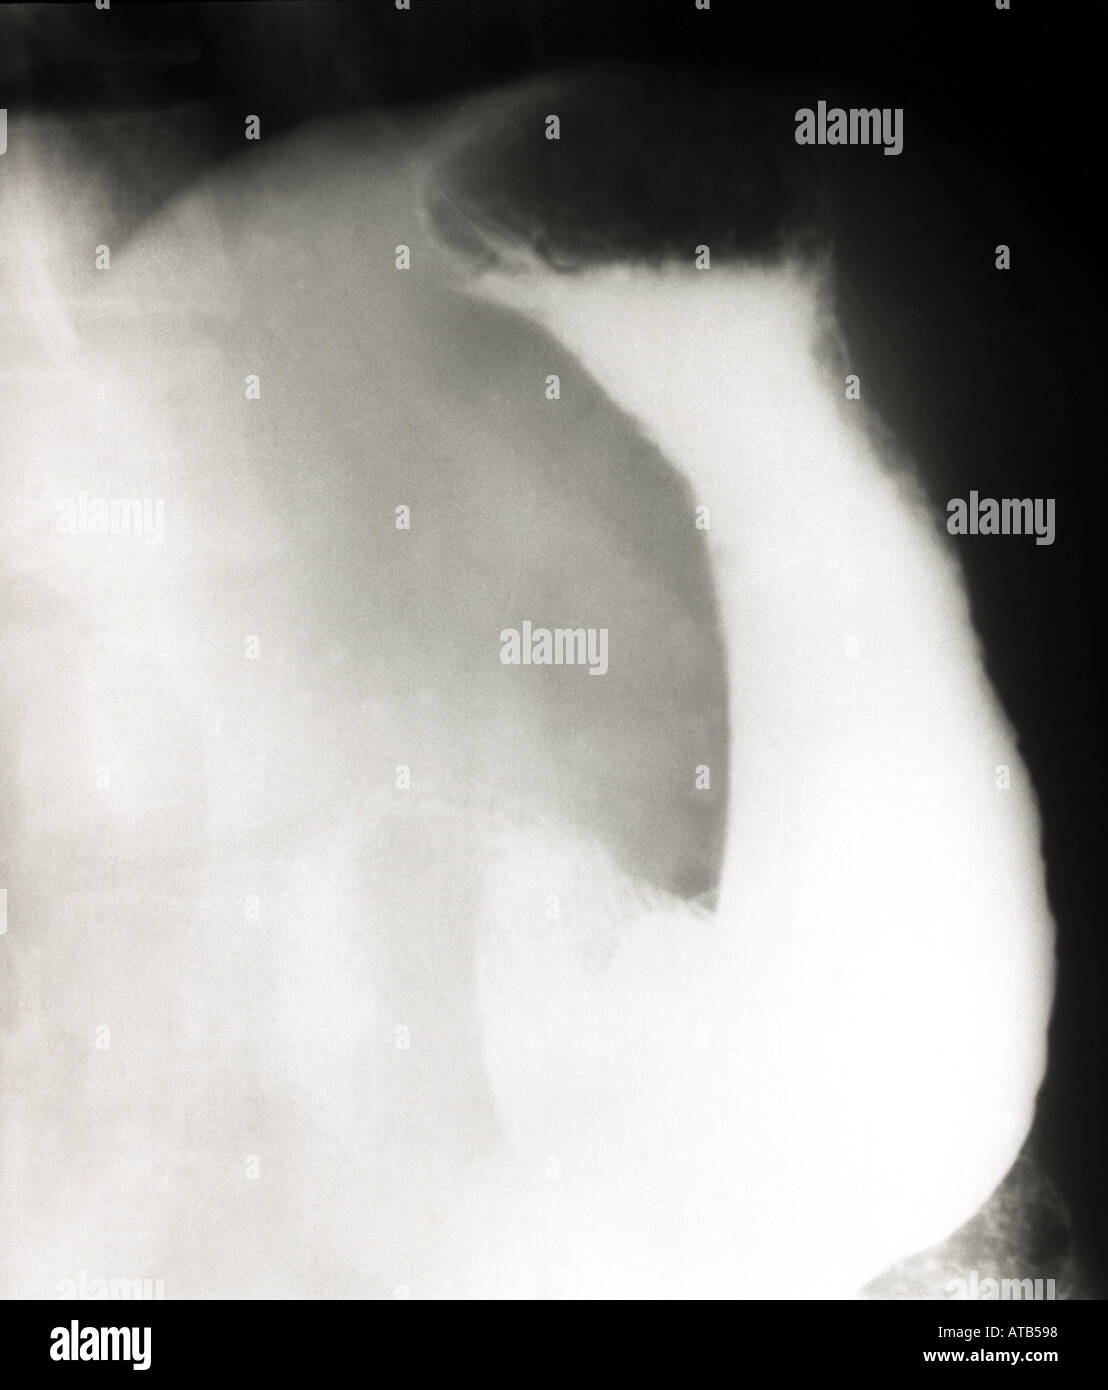 Normal barium swallow - Stock Image